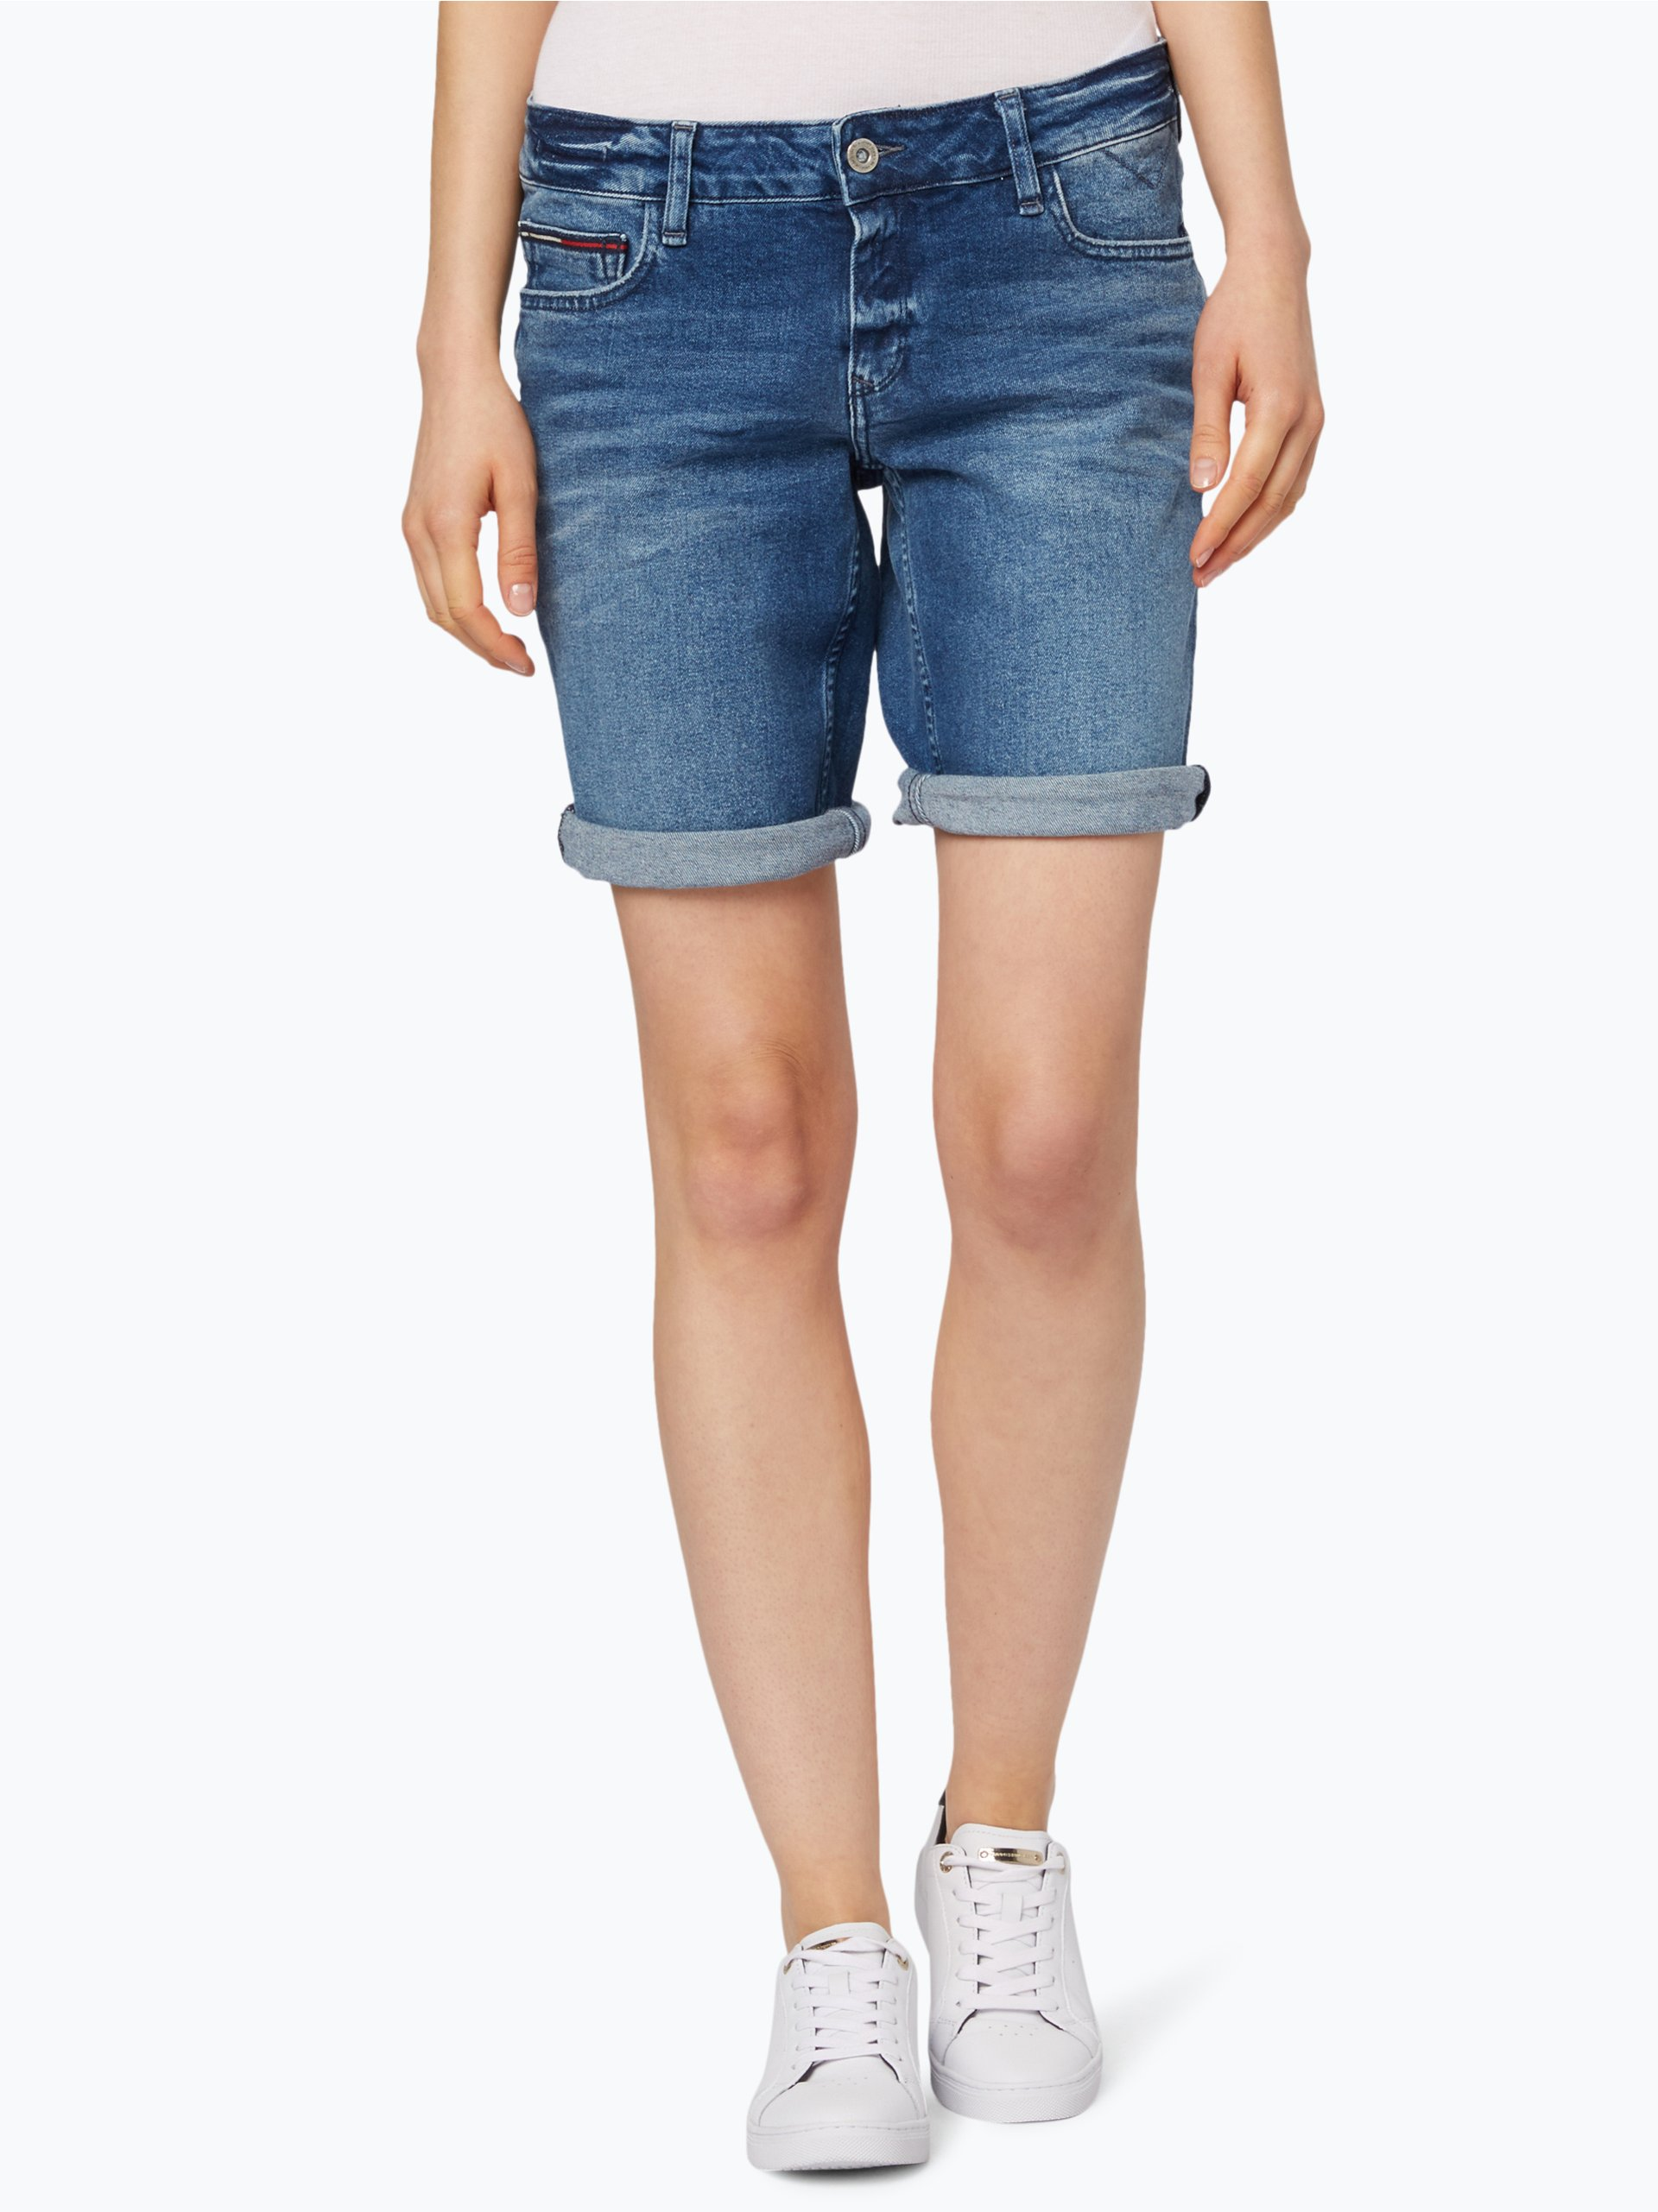 tommy jeans damen shorts 2 online kaufen peek und cloppenburg de. Black Bedroom Furniture Sets. Home Design Ideas